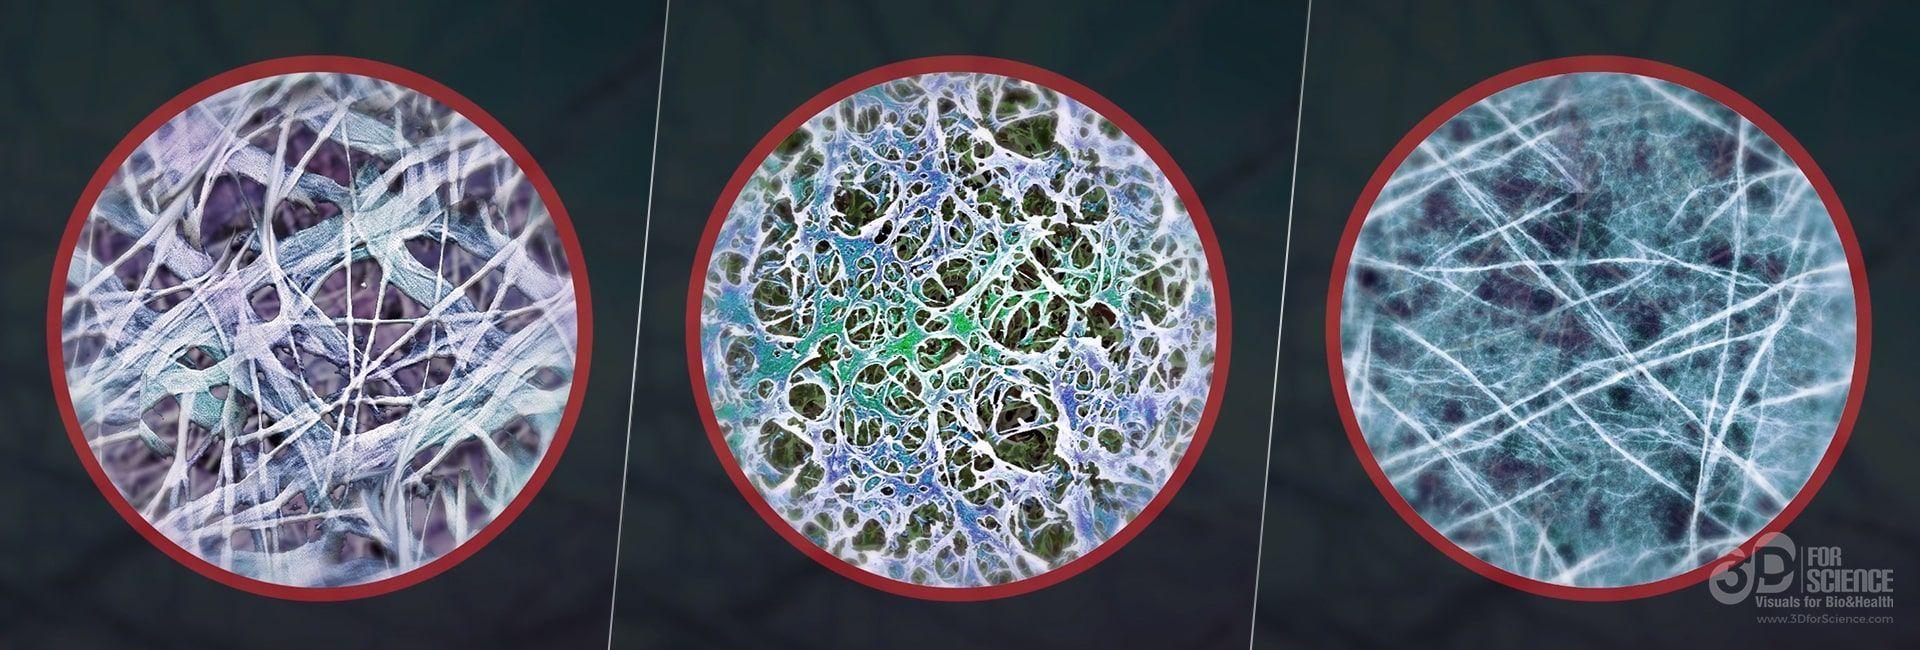 Bioiberica b2cool